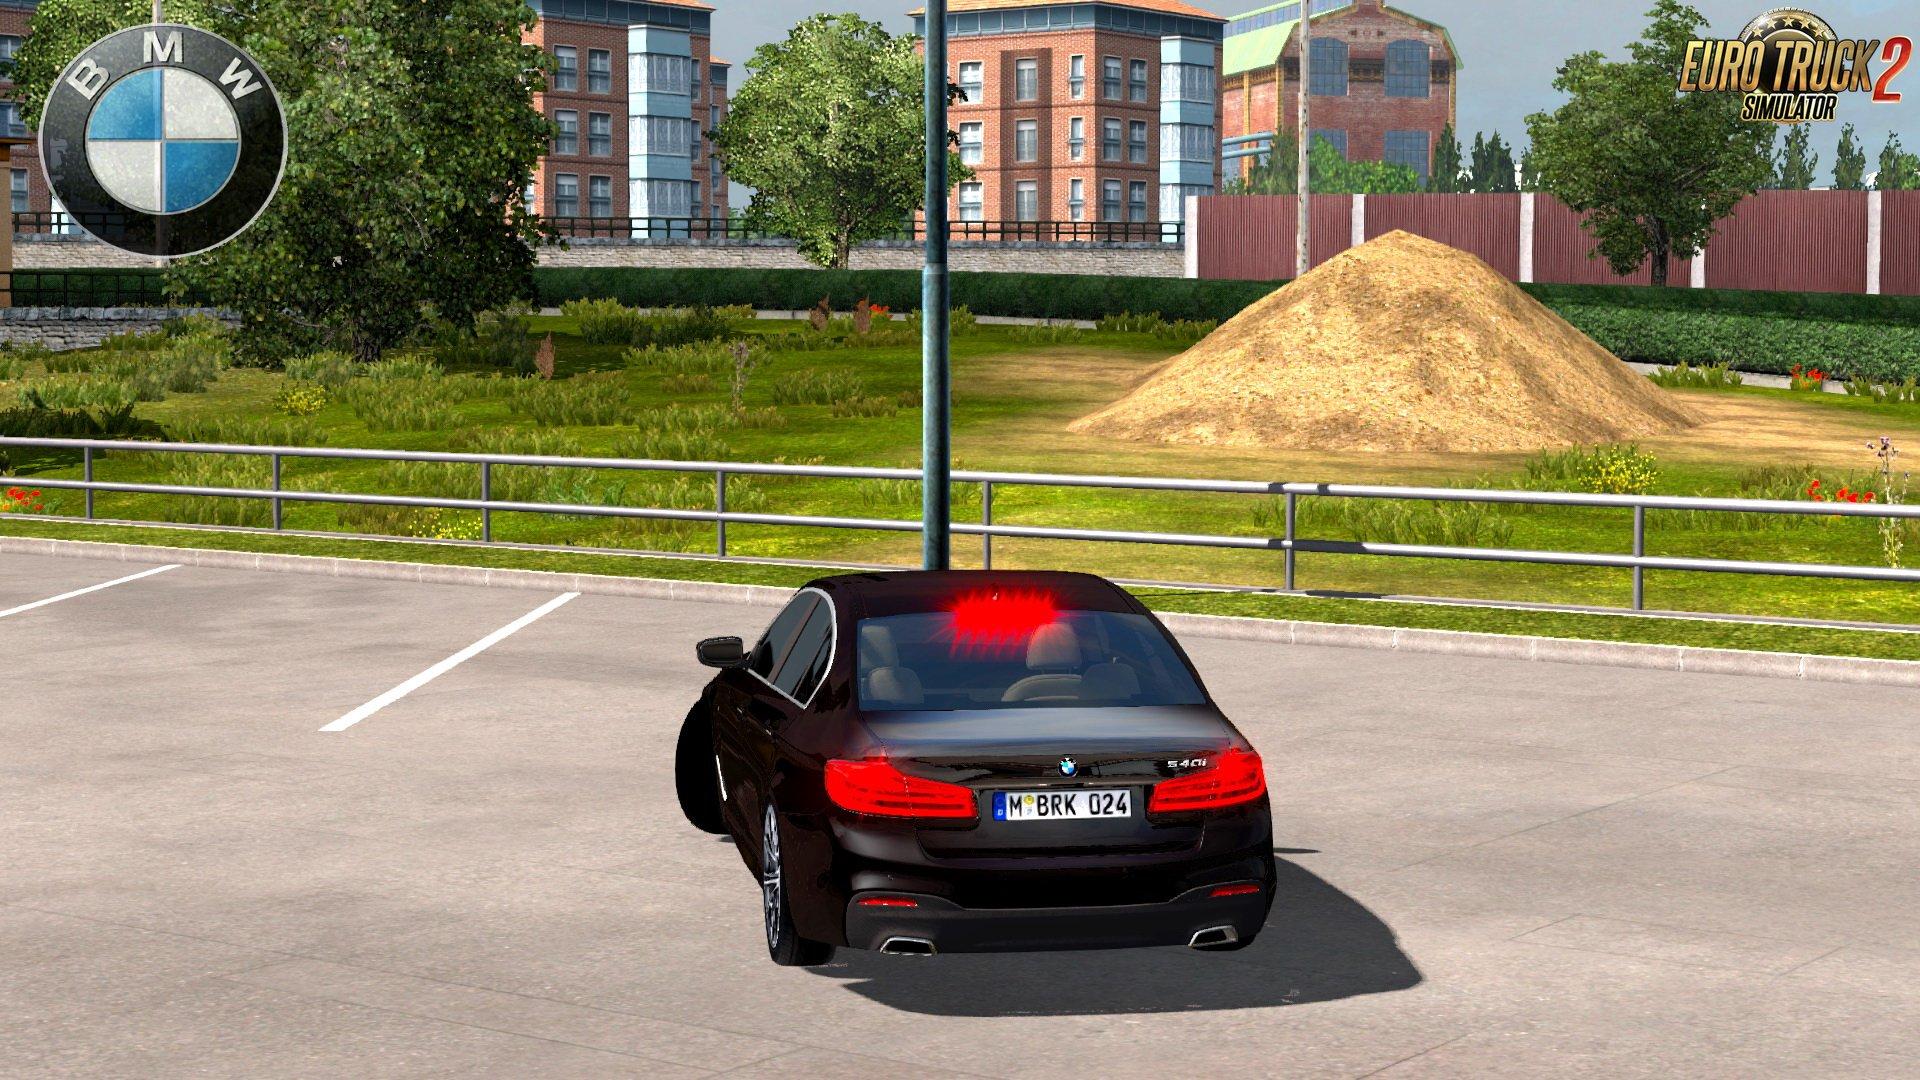 BMW 540i M Sport G30 + Interior v1.0 by BurakTuna24 (1.28.x)